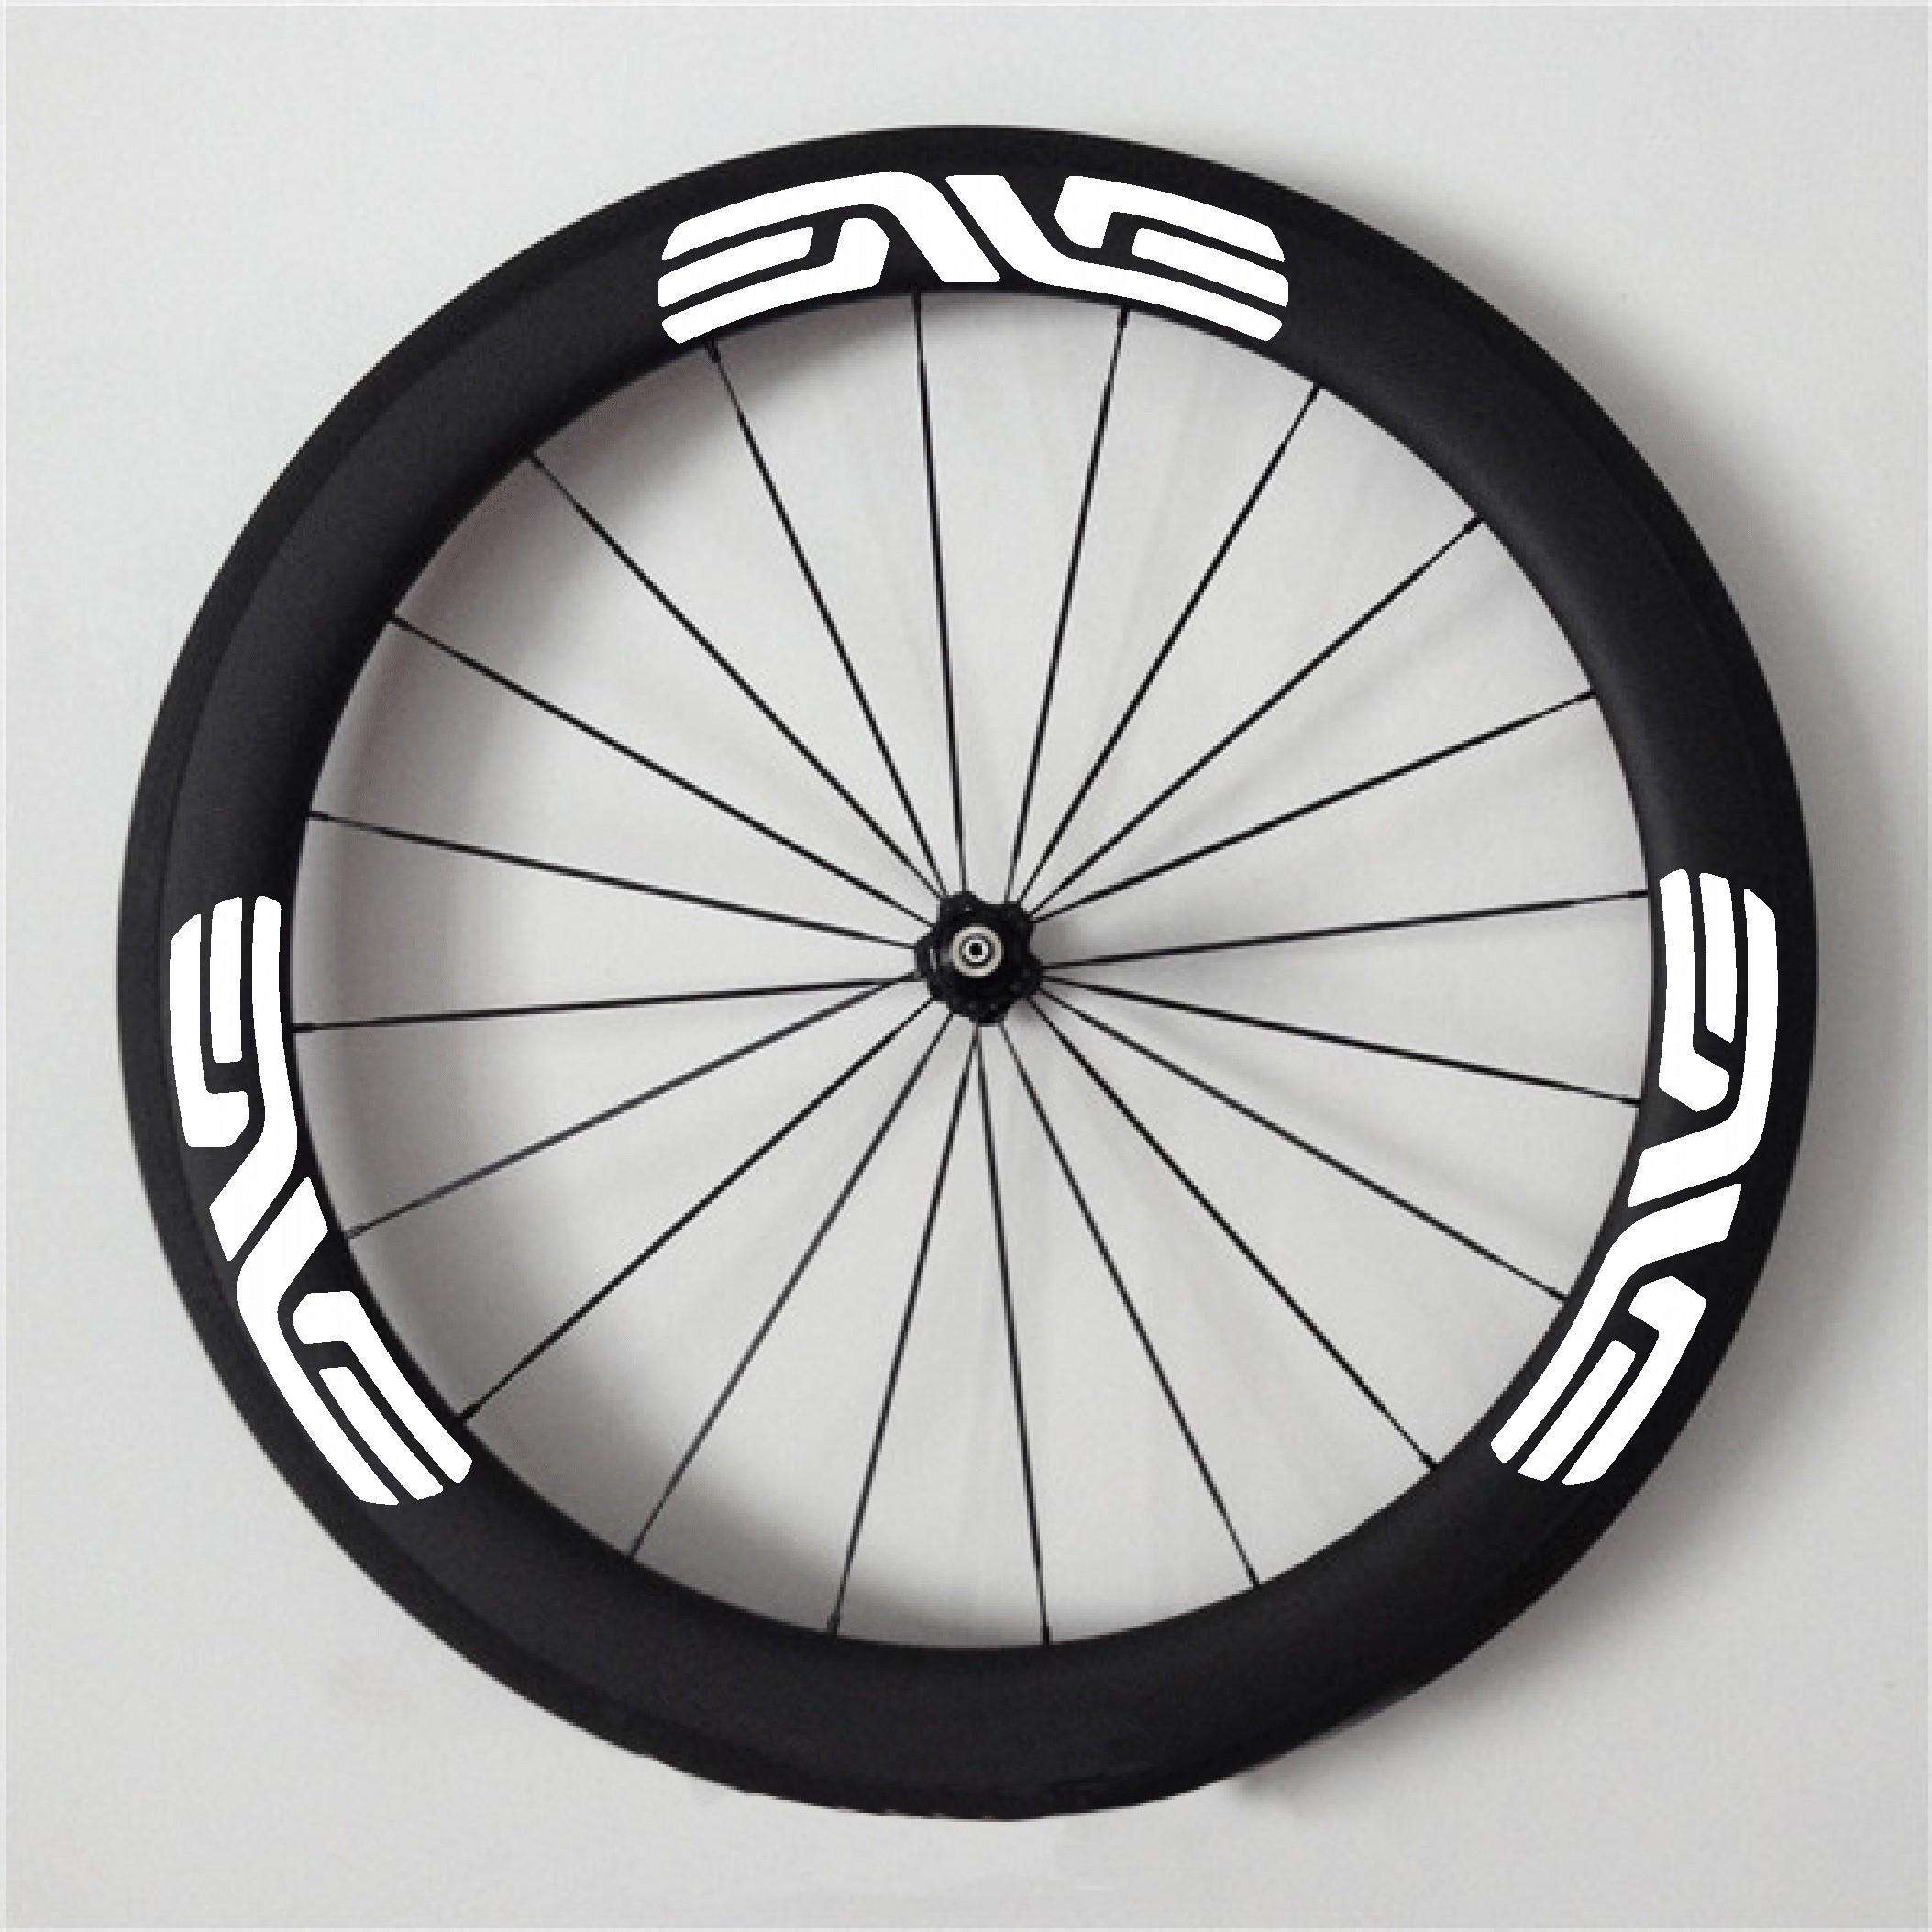 Pegatinas para llantas Bicicleta Montain Bike Envios gratis